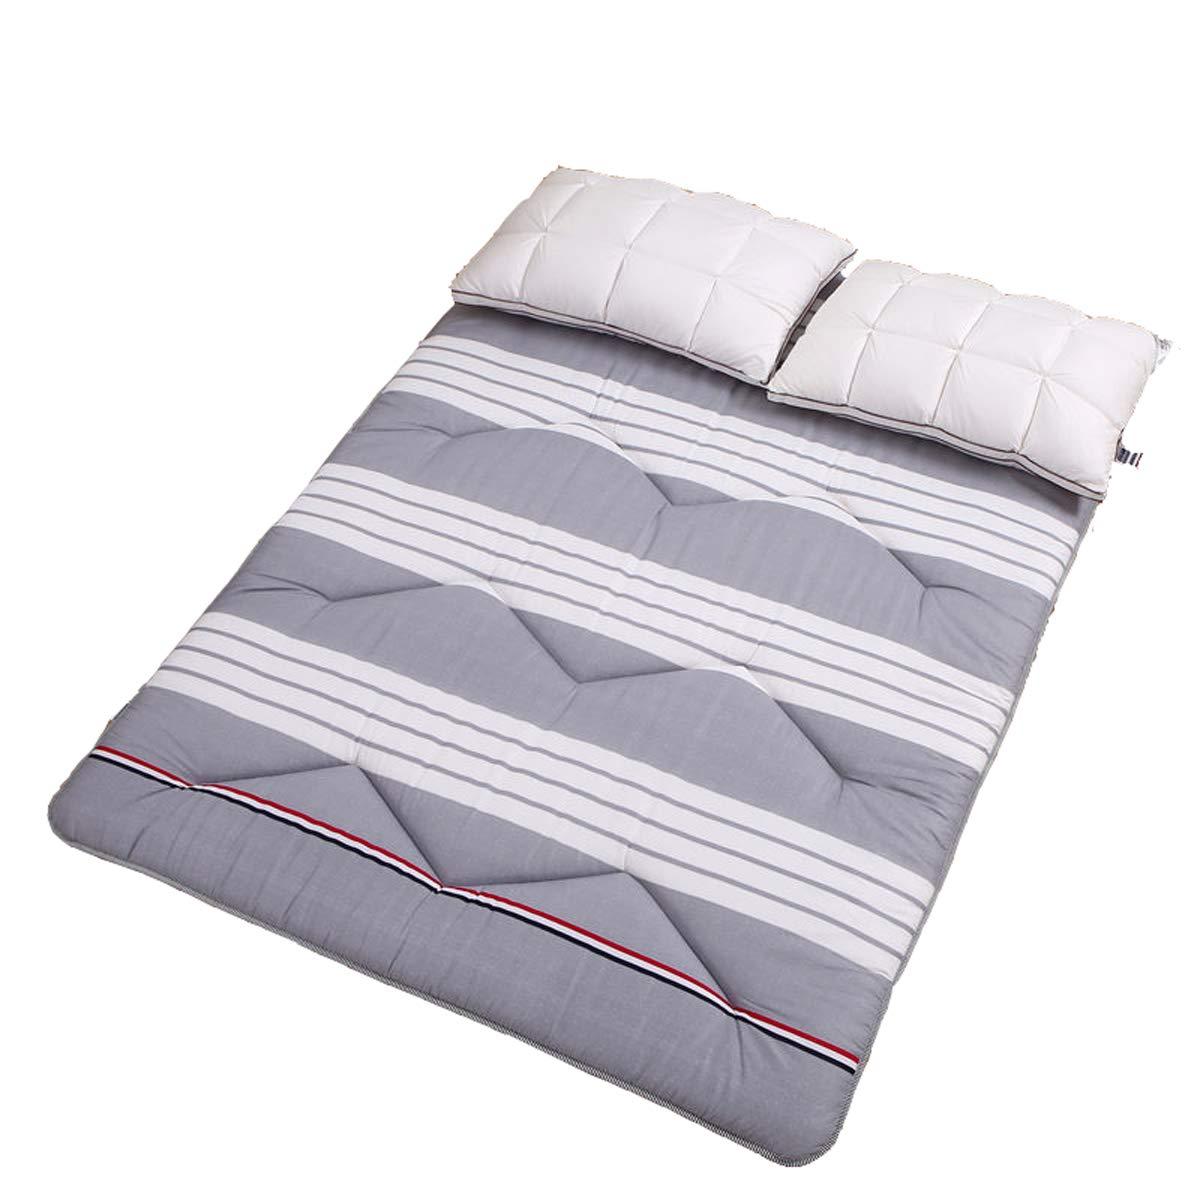 C 100200cm Mattress Topper, Sleeping Tatami Floor mat Quilted Hypoallergenic Folding Futon Mattress Soft Japanese Student Dormitory Mattress Pad,F,180  200cm